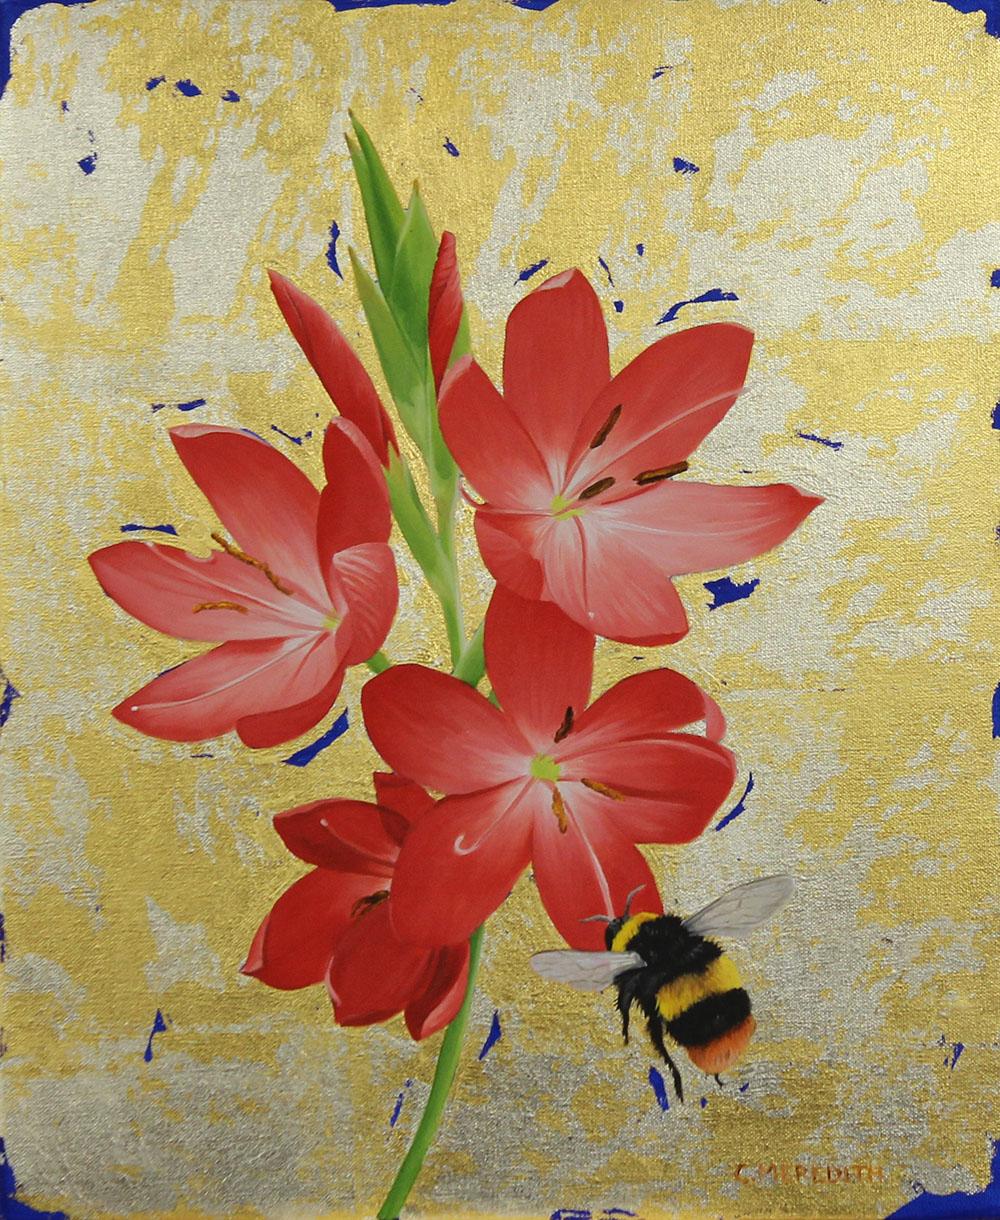 Kaffir Lily & Early Bumblebee